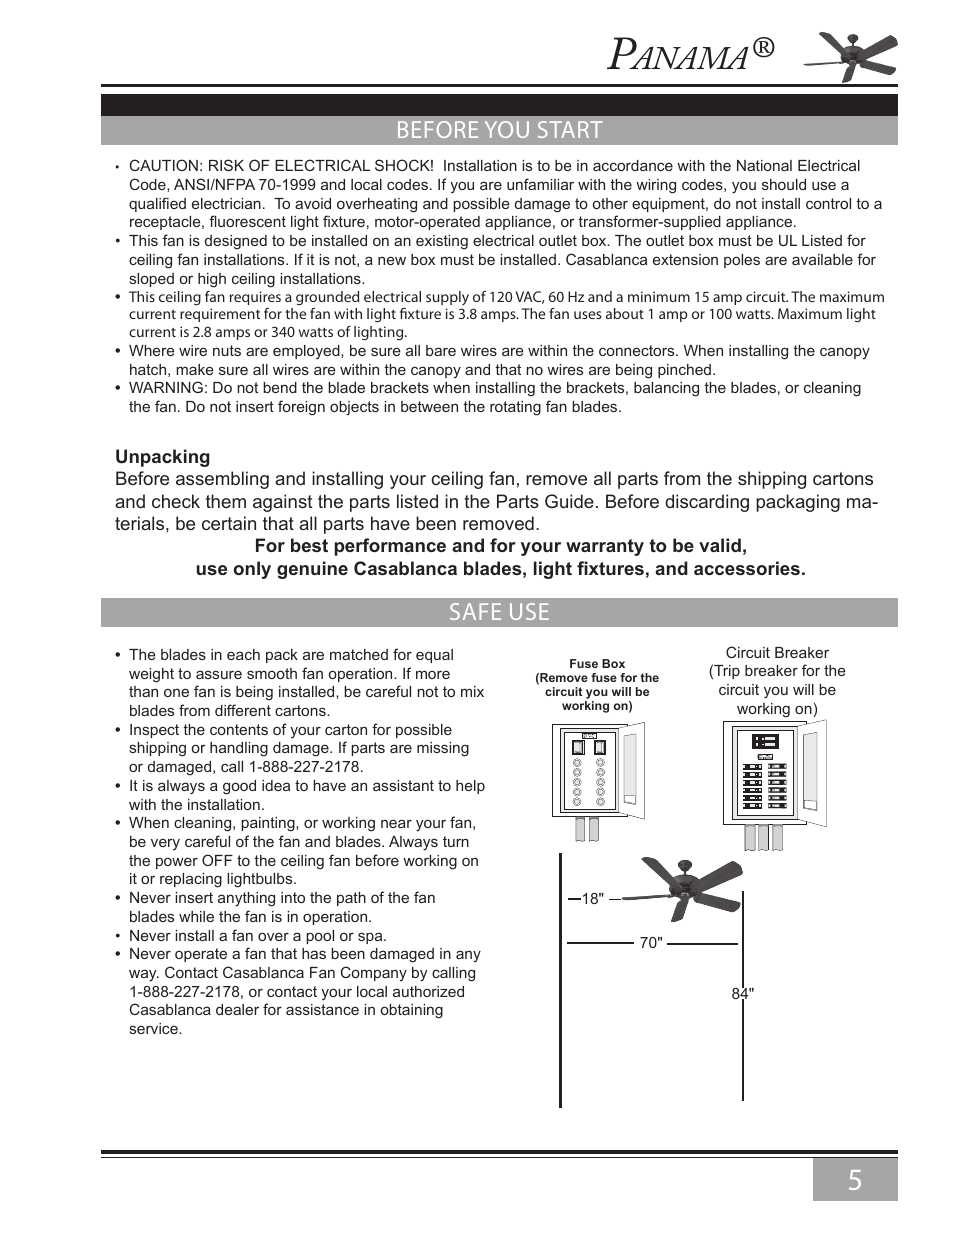 Before You Start Safe Use Anama Casablanca Fan Company Panama Fuse Box Light Ceiling 6643z User Manual Page 5 22